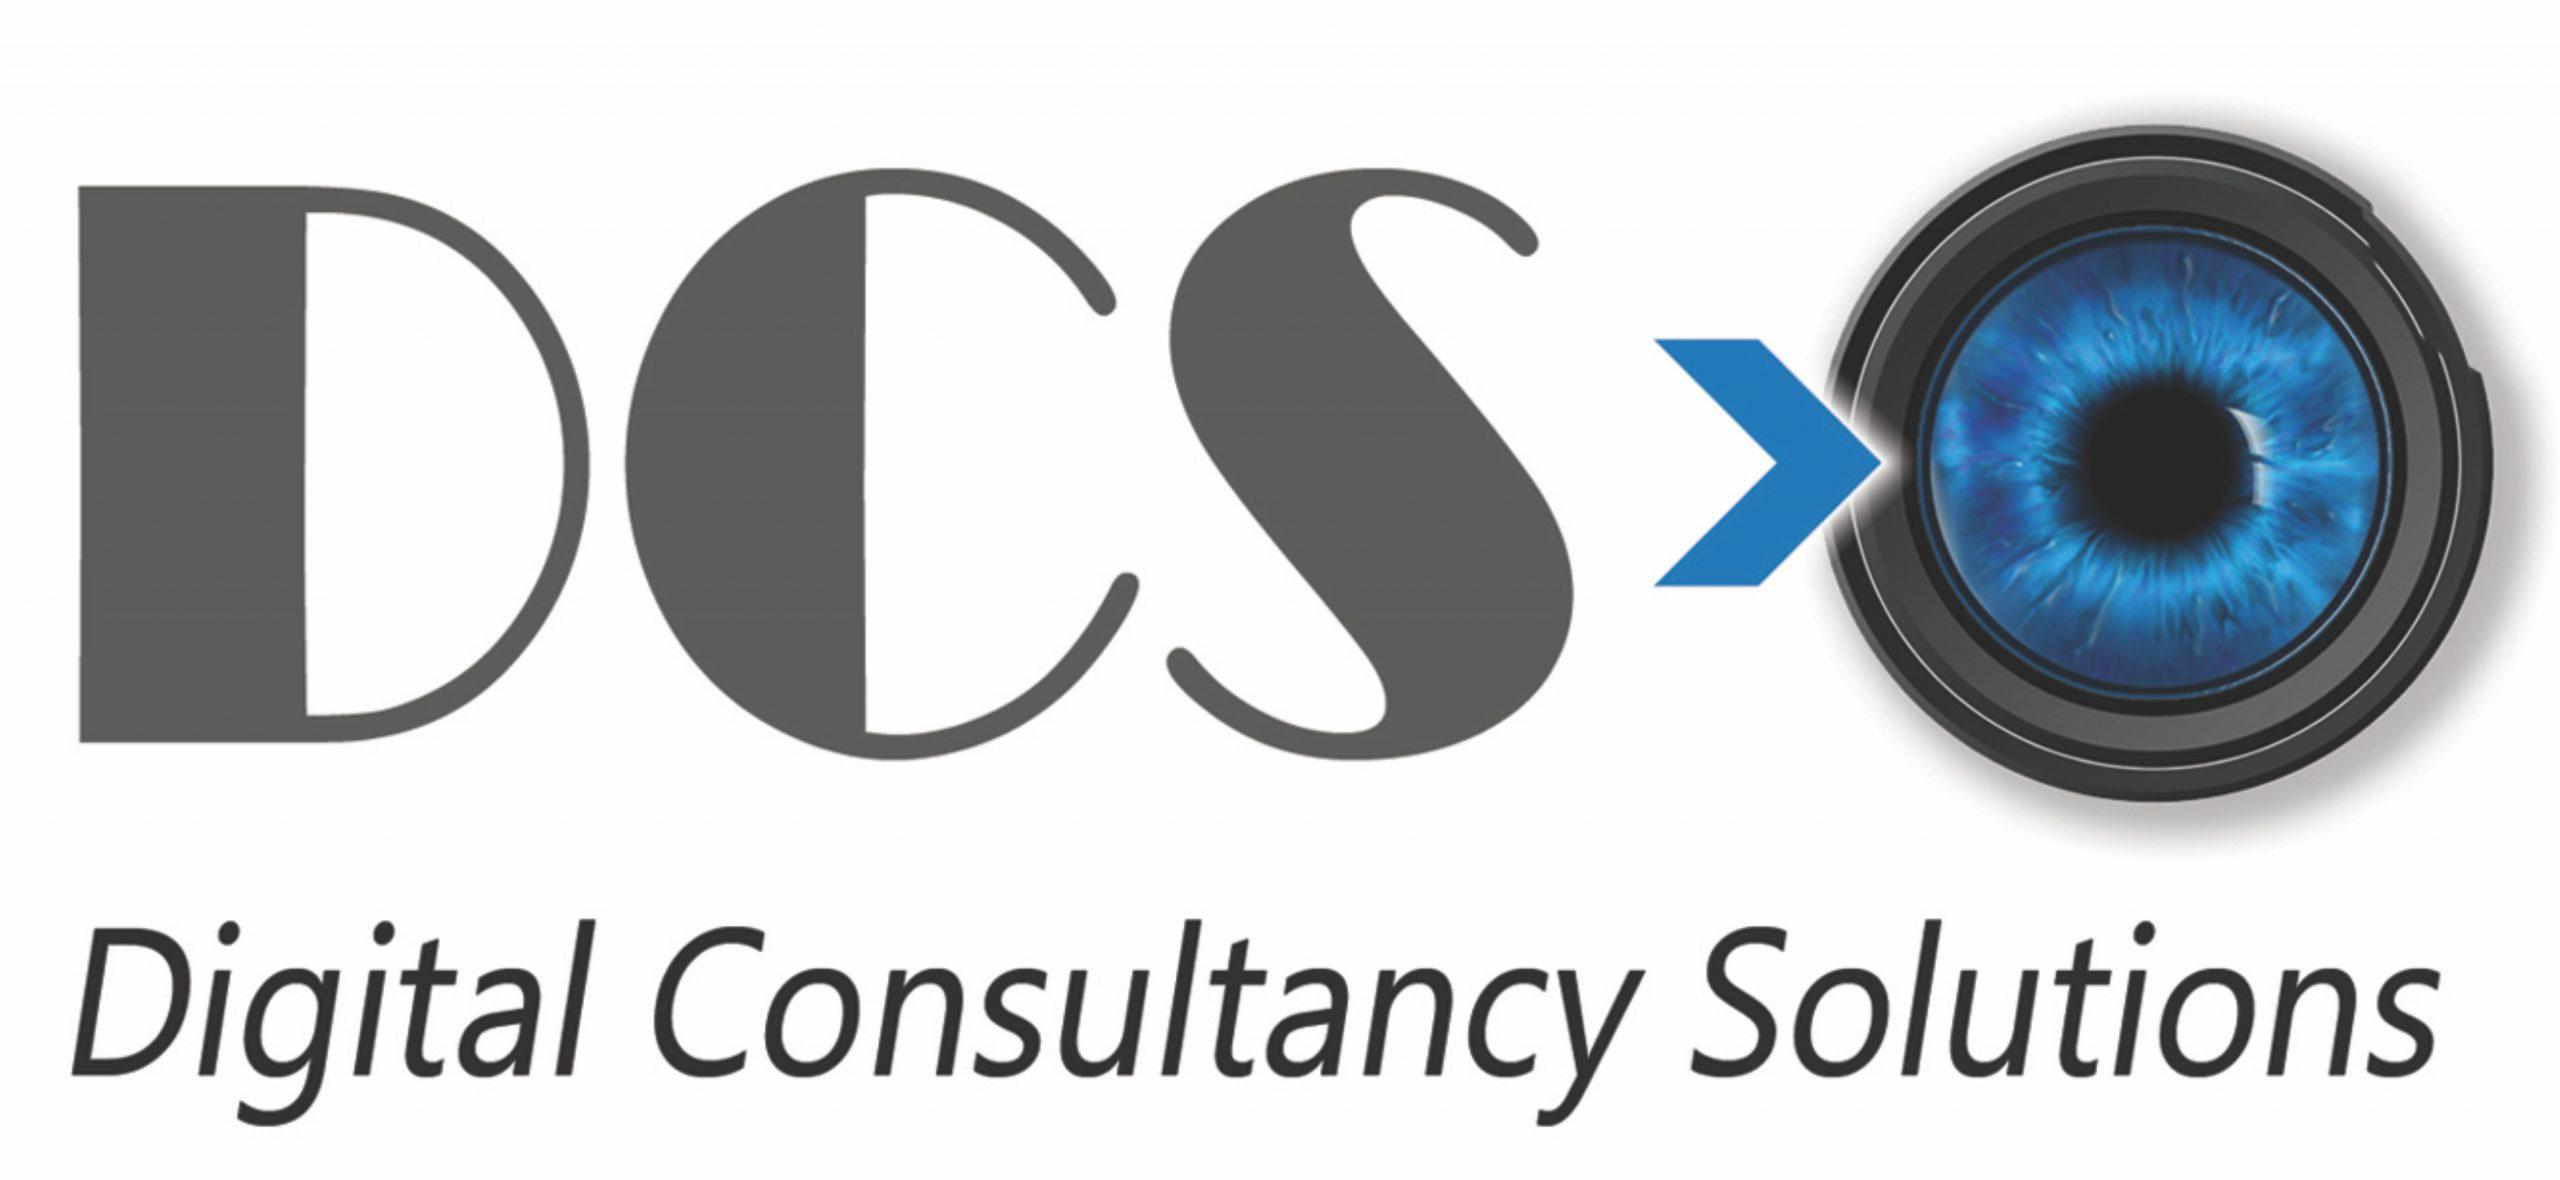 Digital Consultancy Solutions